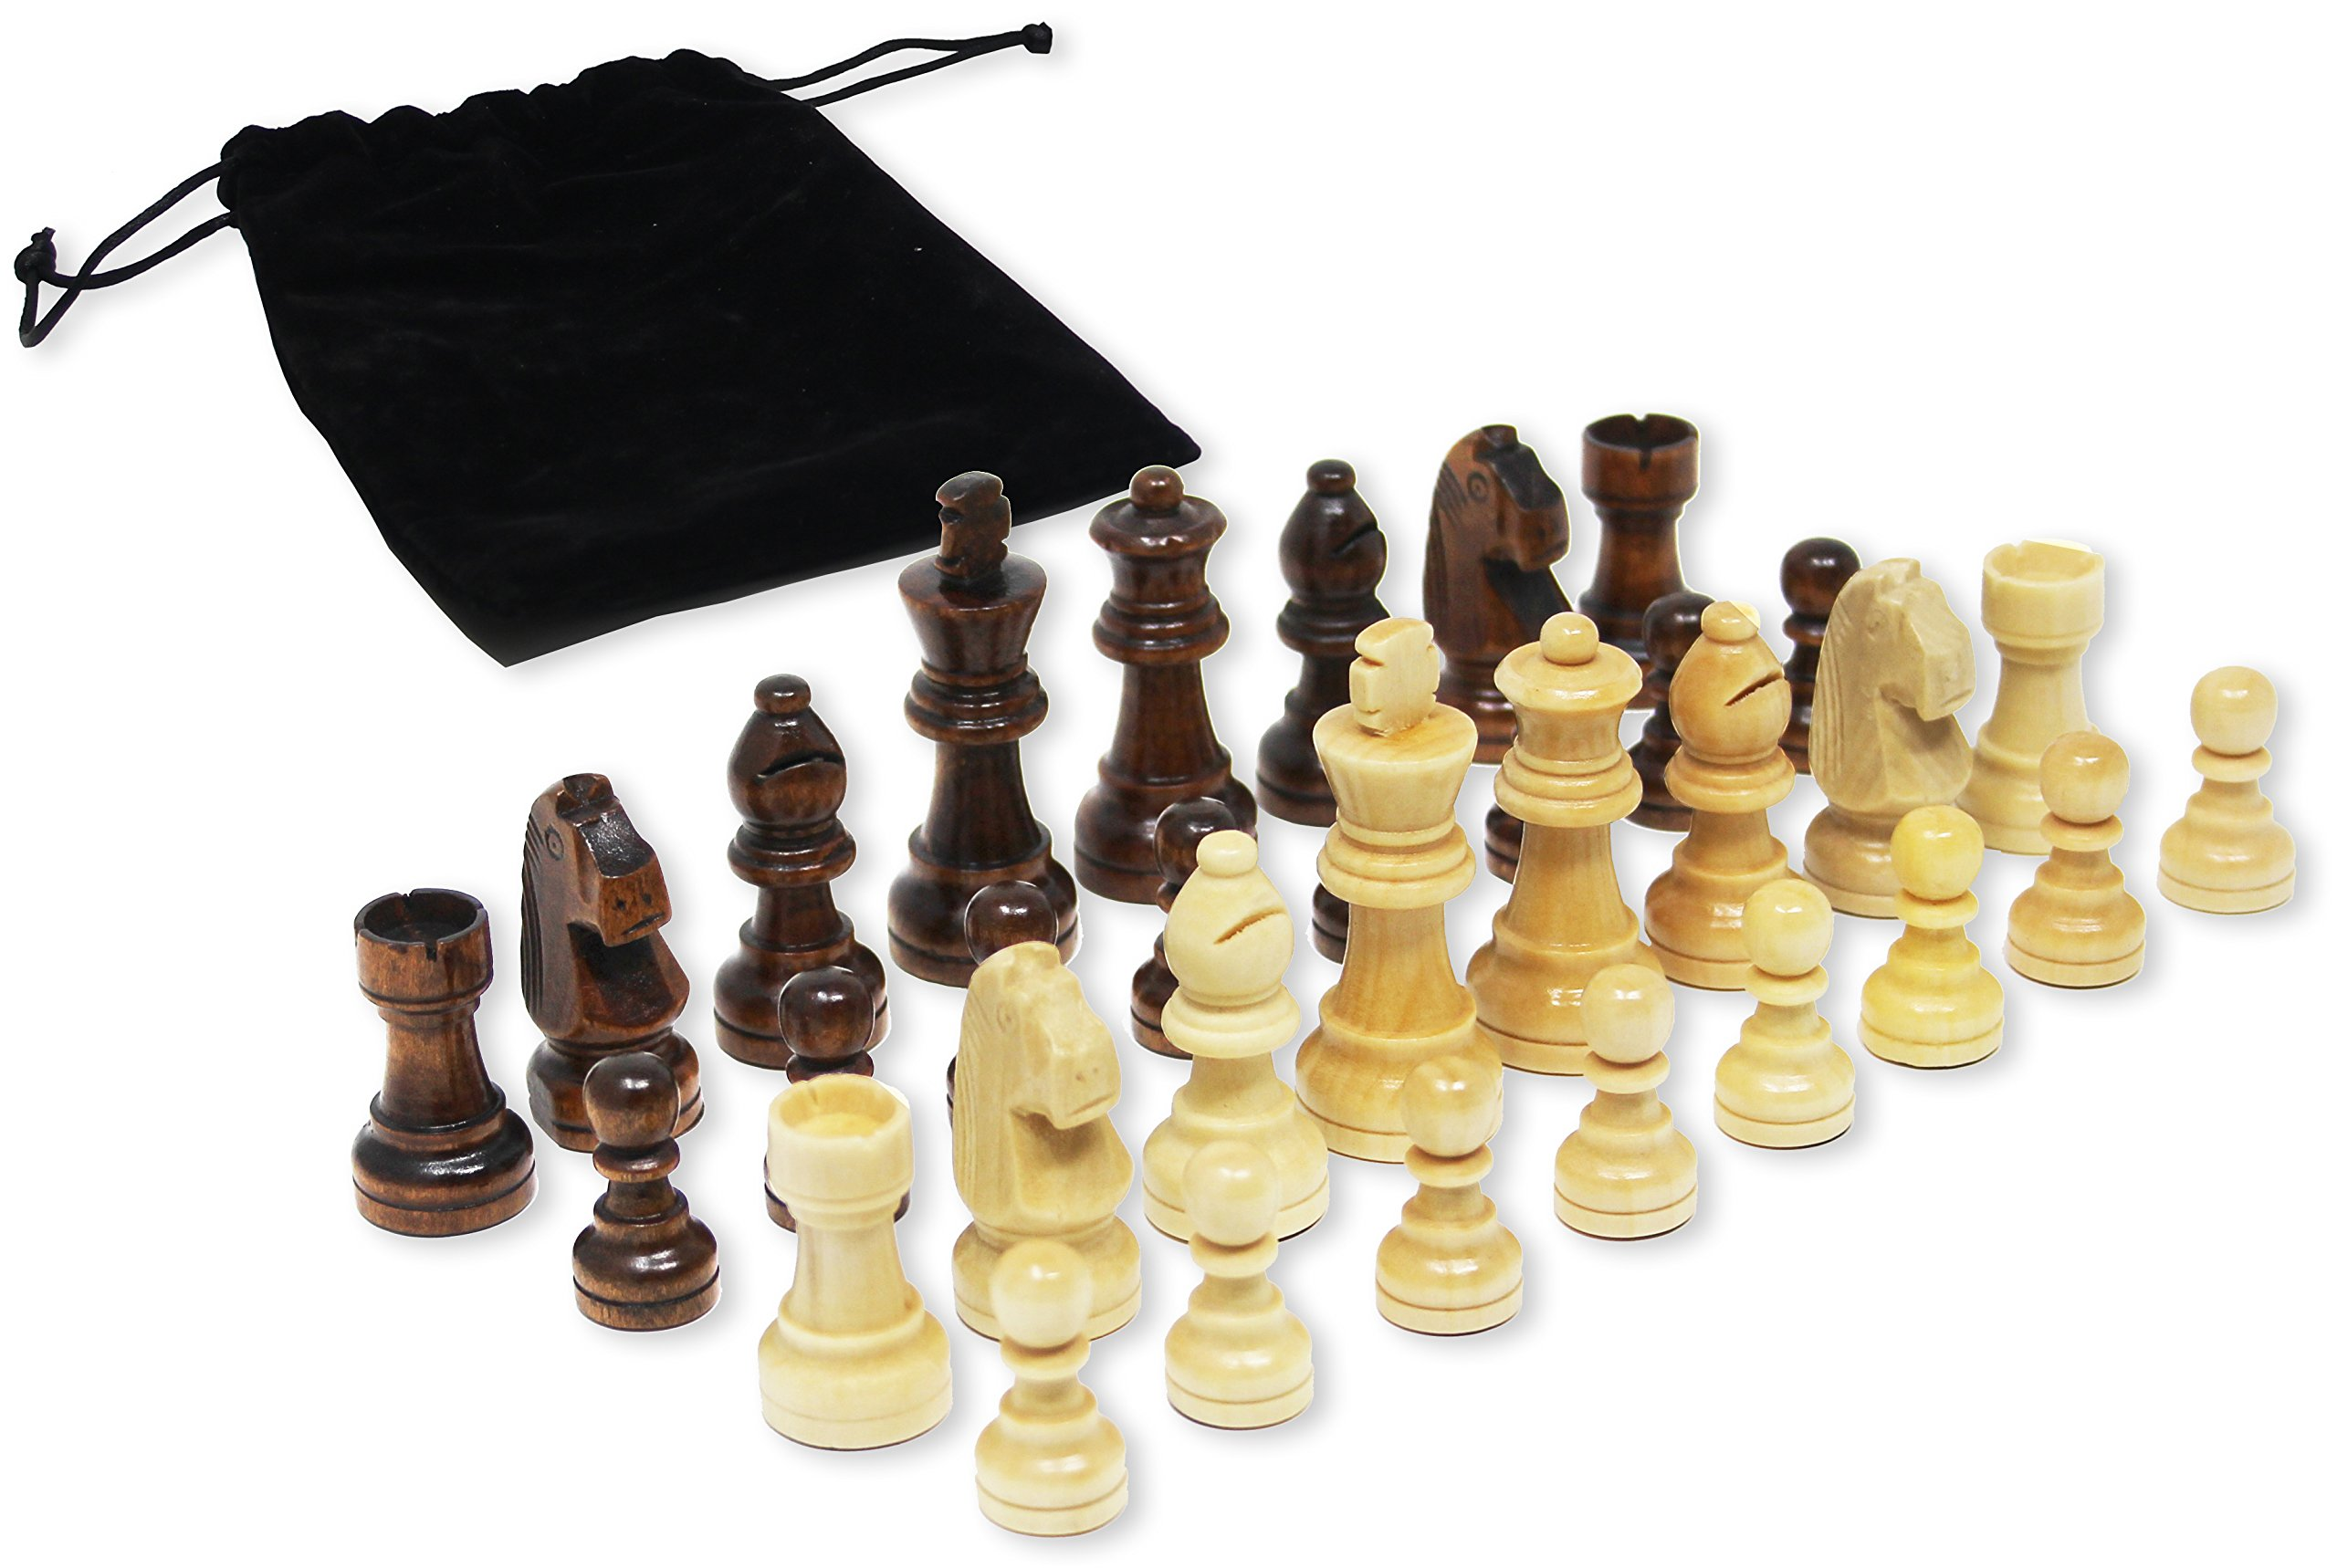 Da Vinci Staunton Wood Chess Pieces (32 Chessmen) & Storage Bag … (3 Inch King) by DaVinci (Image #1)